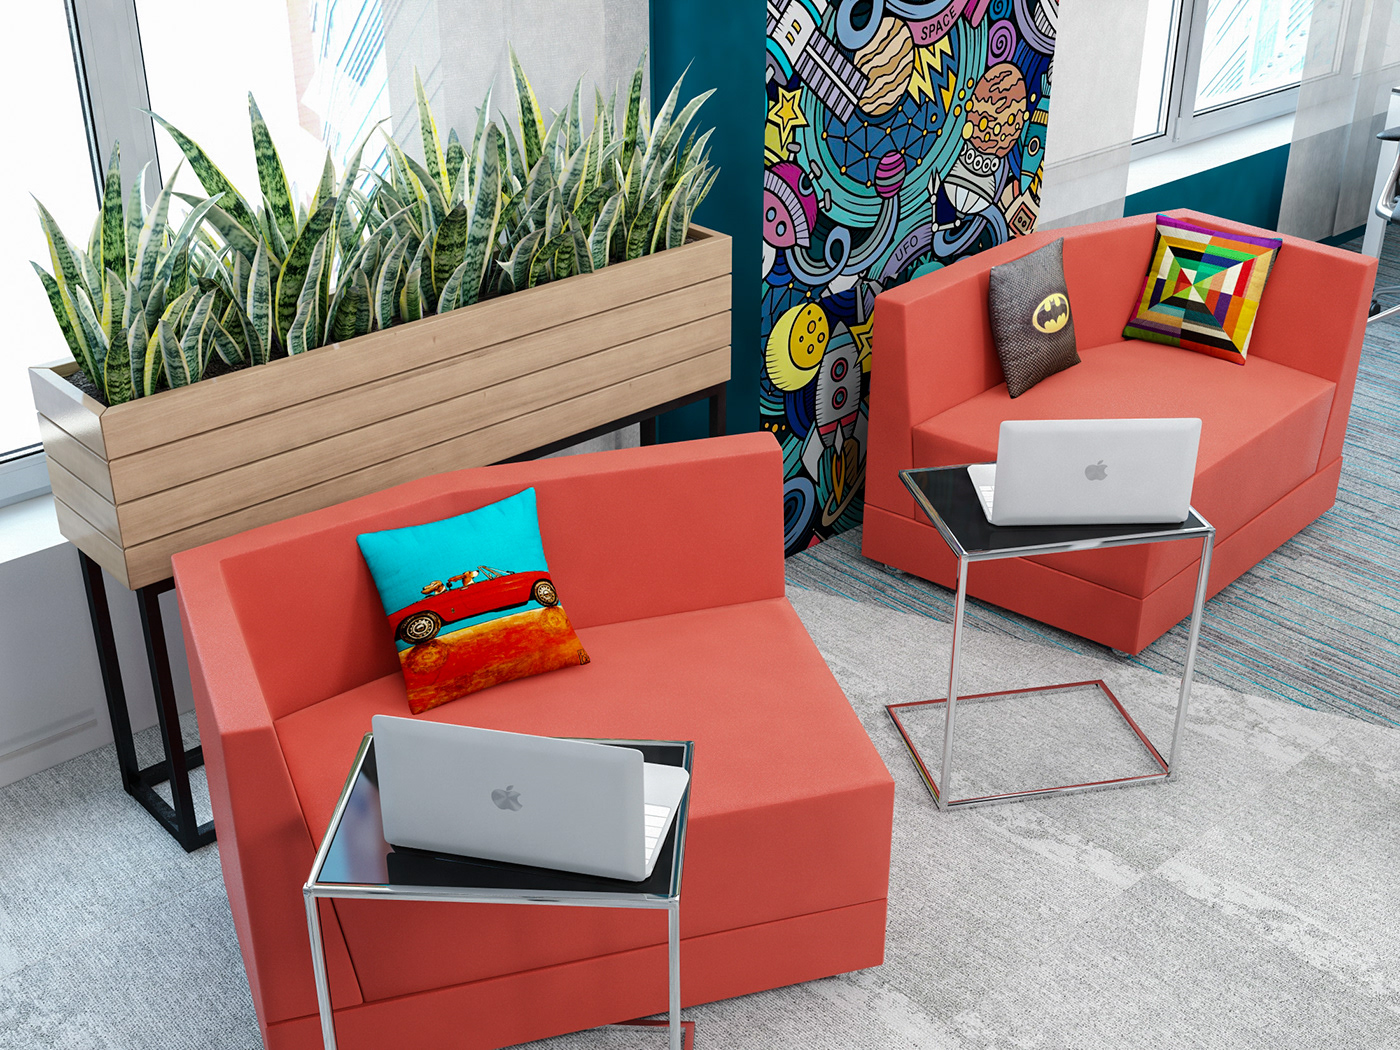 coworking space coworking OFICCE Pop Art коворкинг Office Design openspace Office interior